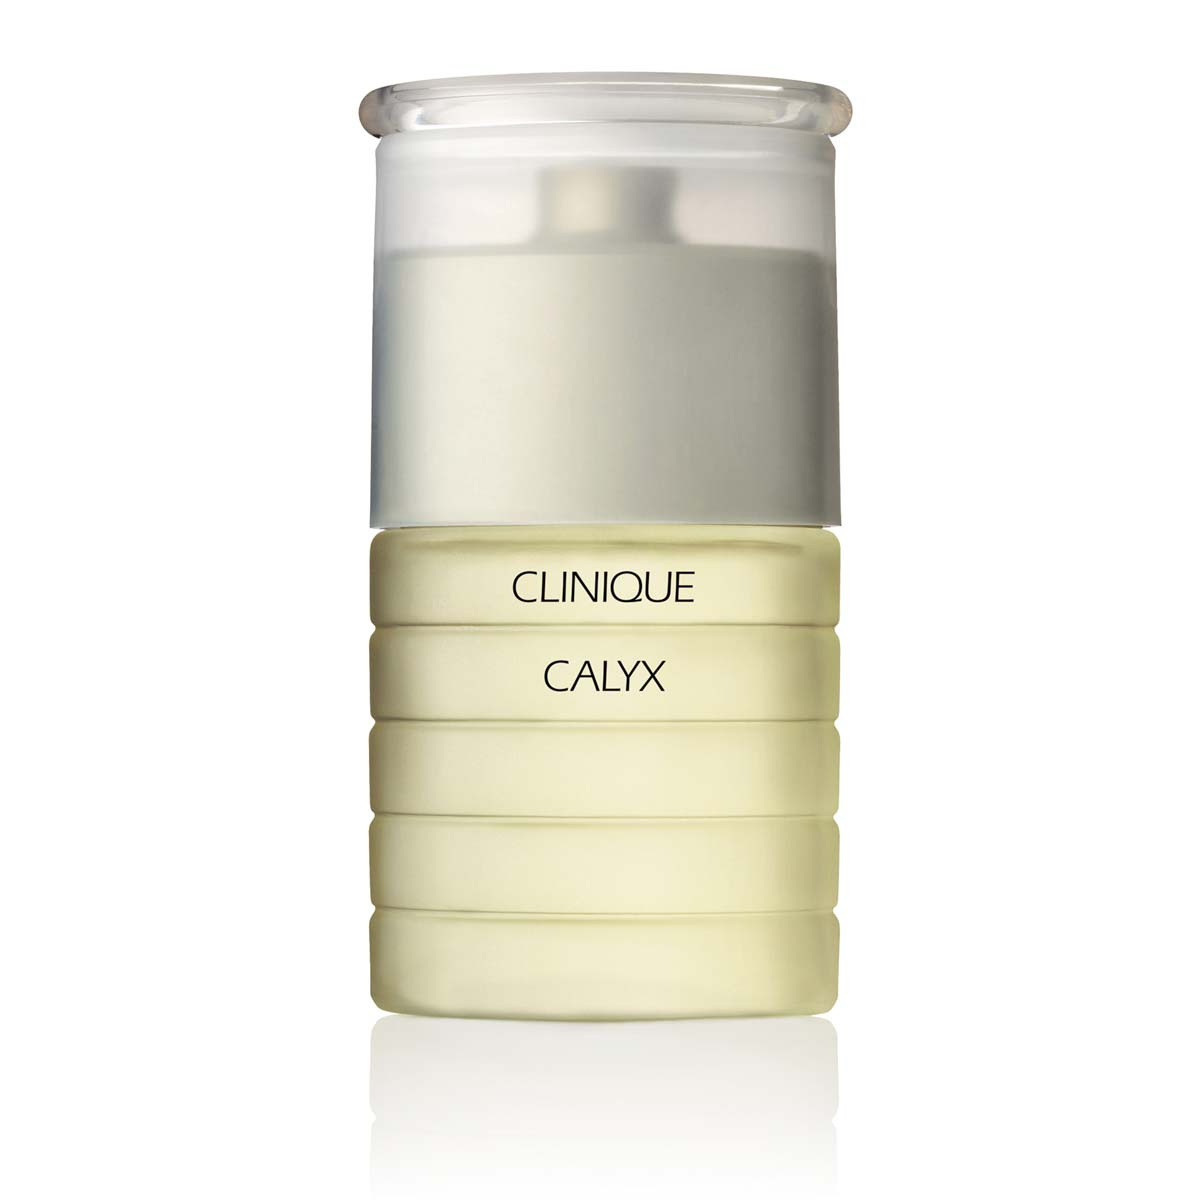 Clinique calyx exhilarating fragrance 50 ml, Marrone, large image number 0